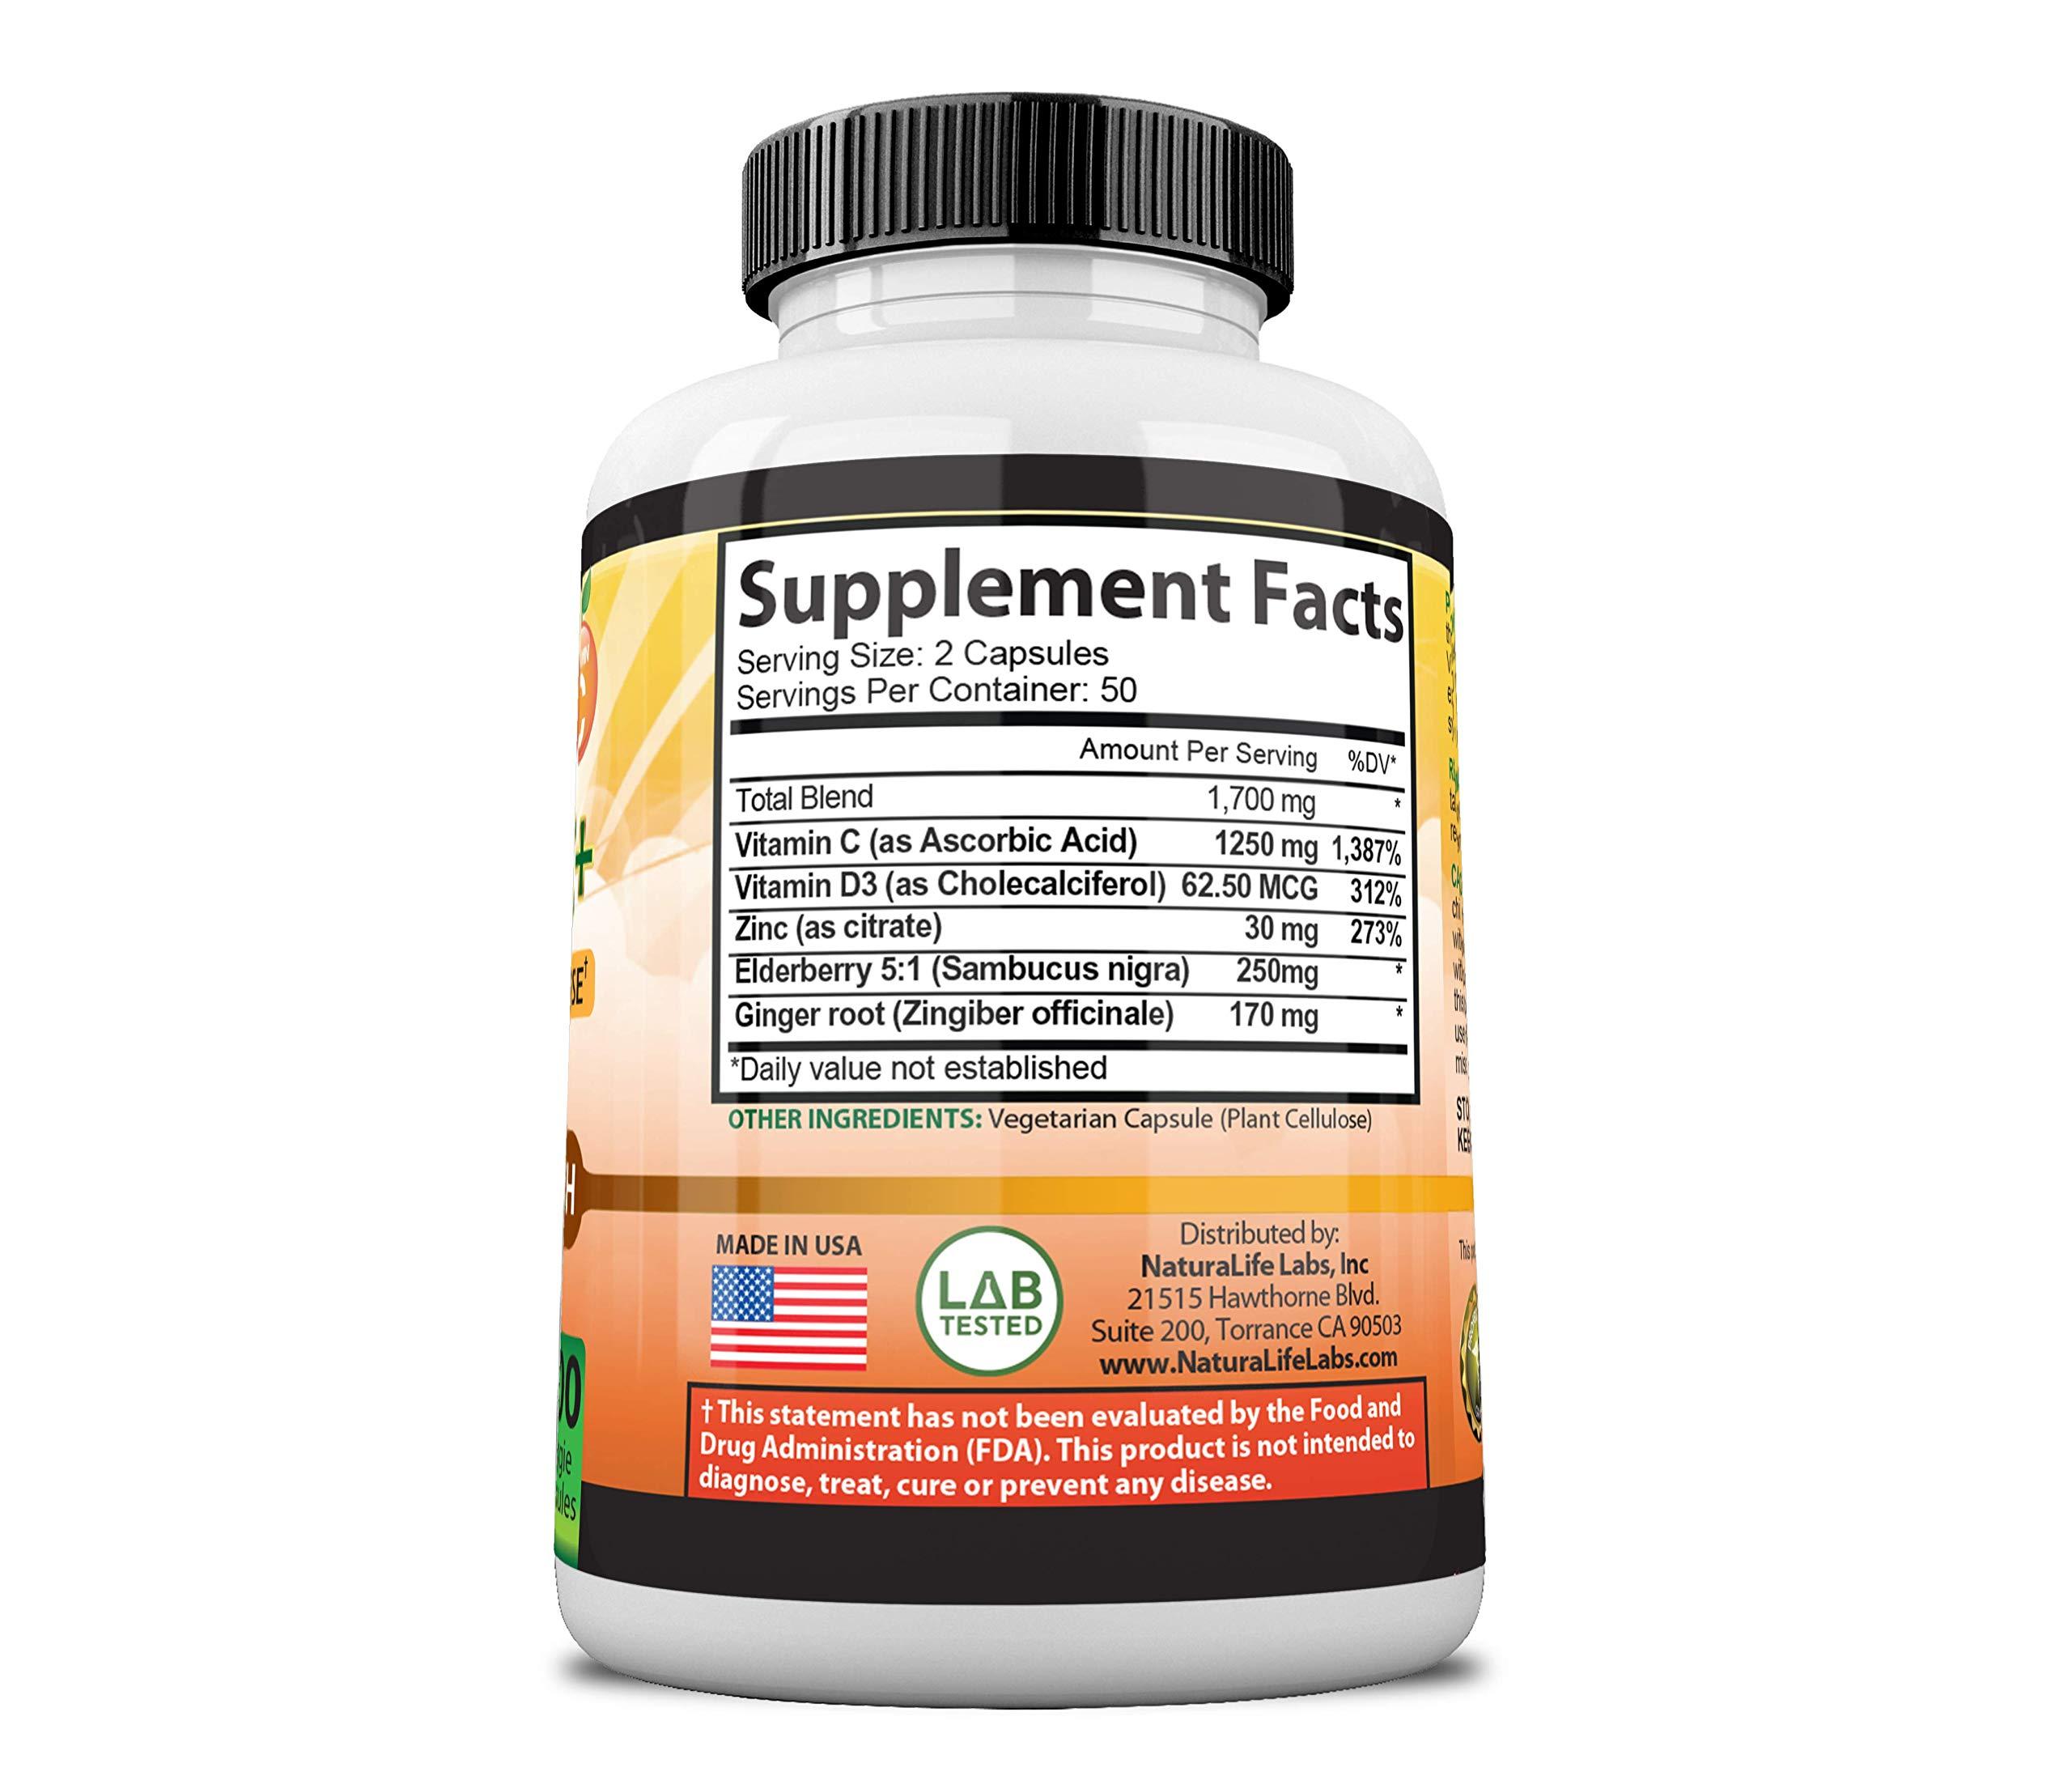 Vitamin C 1,700 MG with Vitamin D3, Zinc, Elderberry, Ginger Root - Maximum Strength Multi System Immune Support- 100 Veggie Capsules